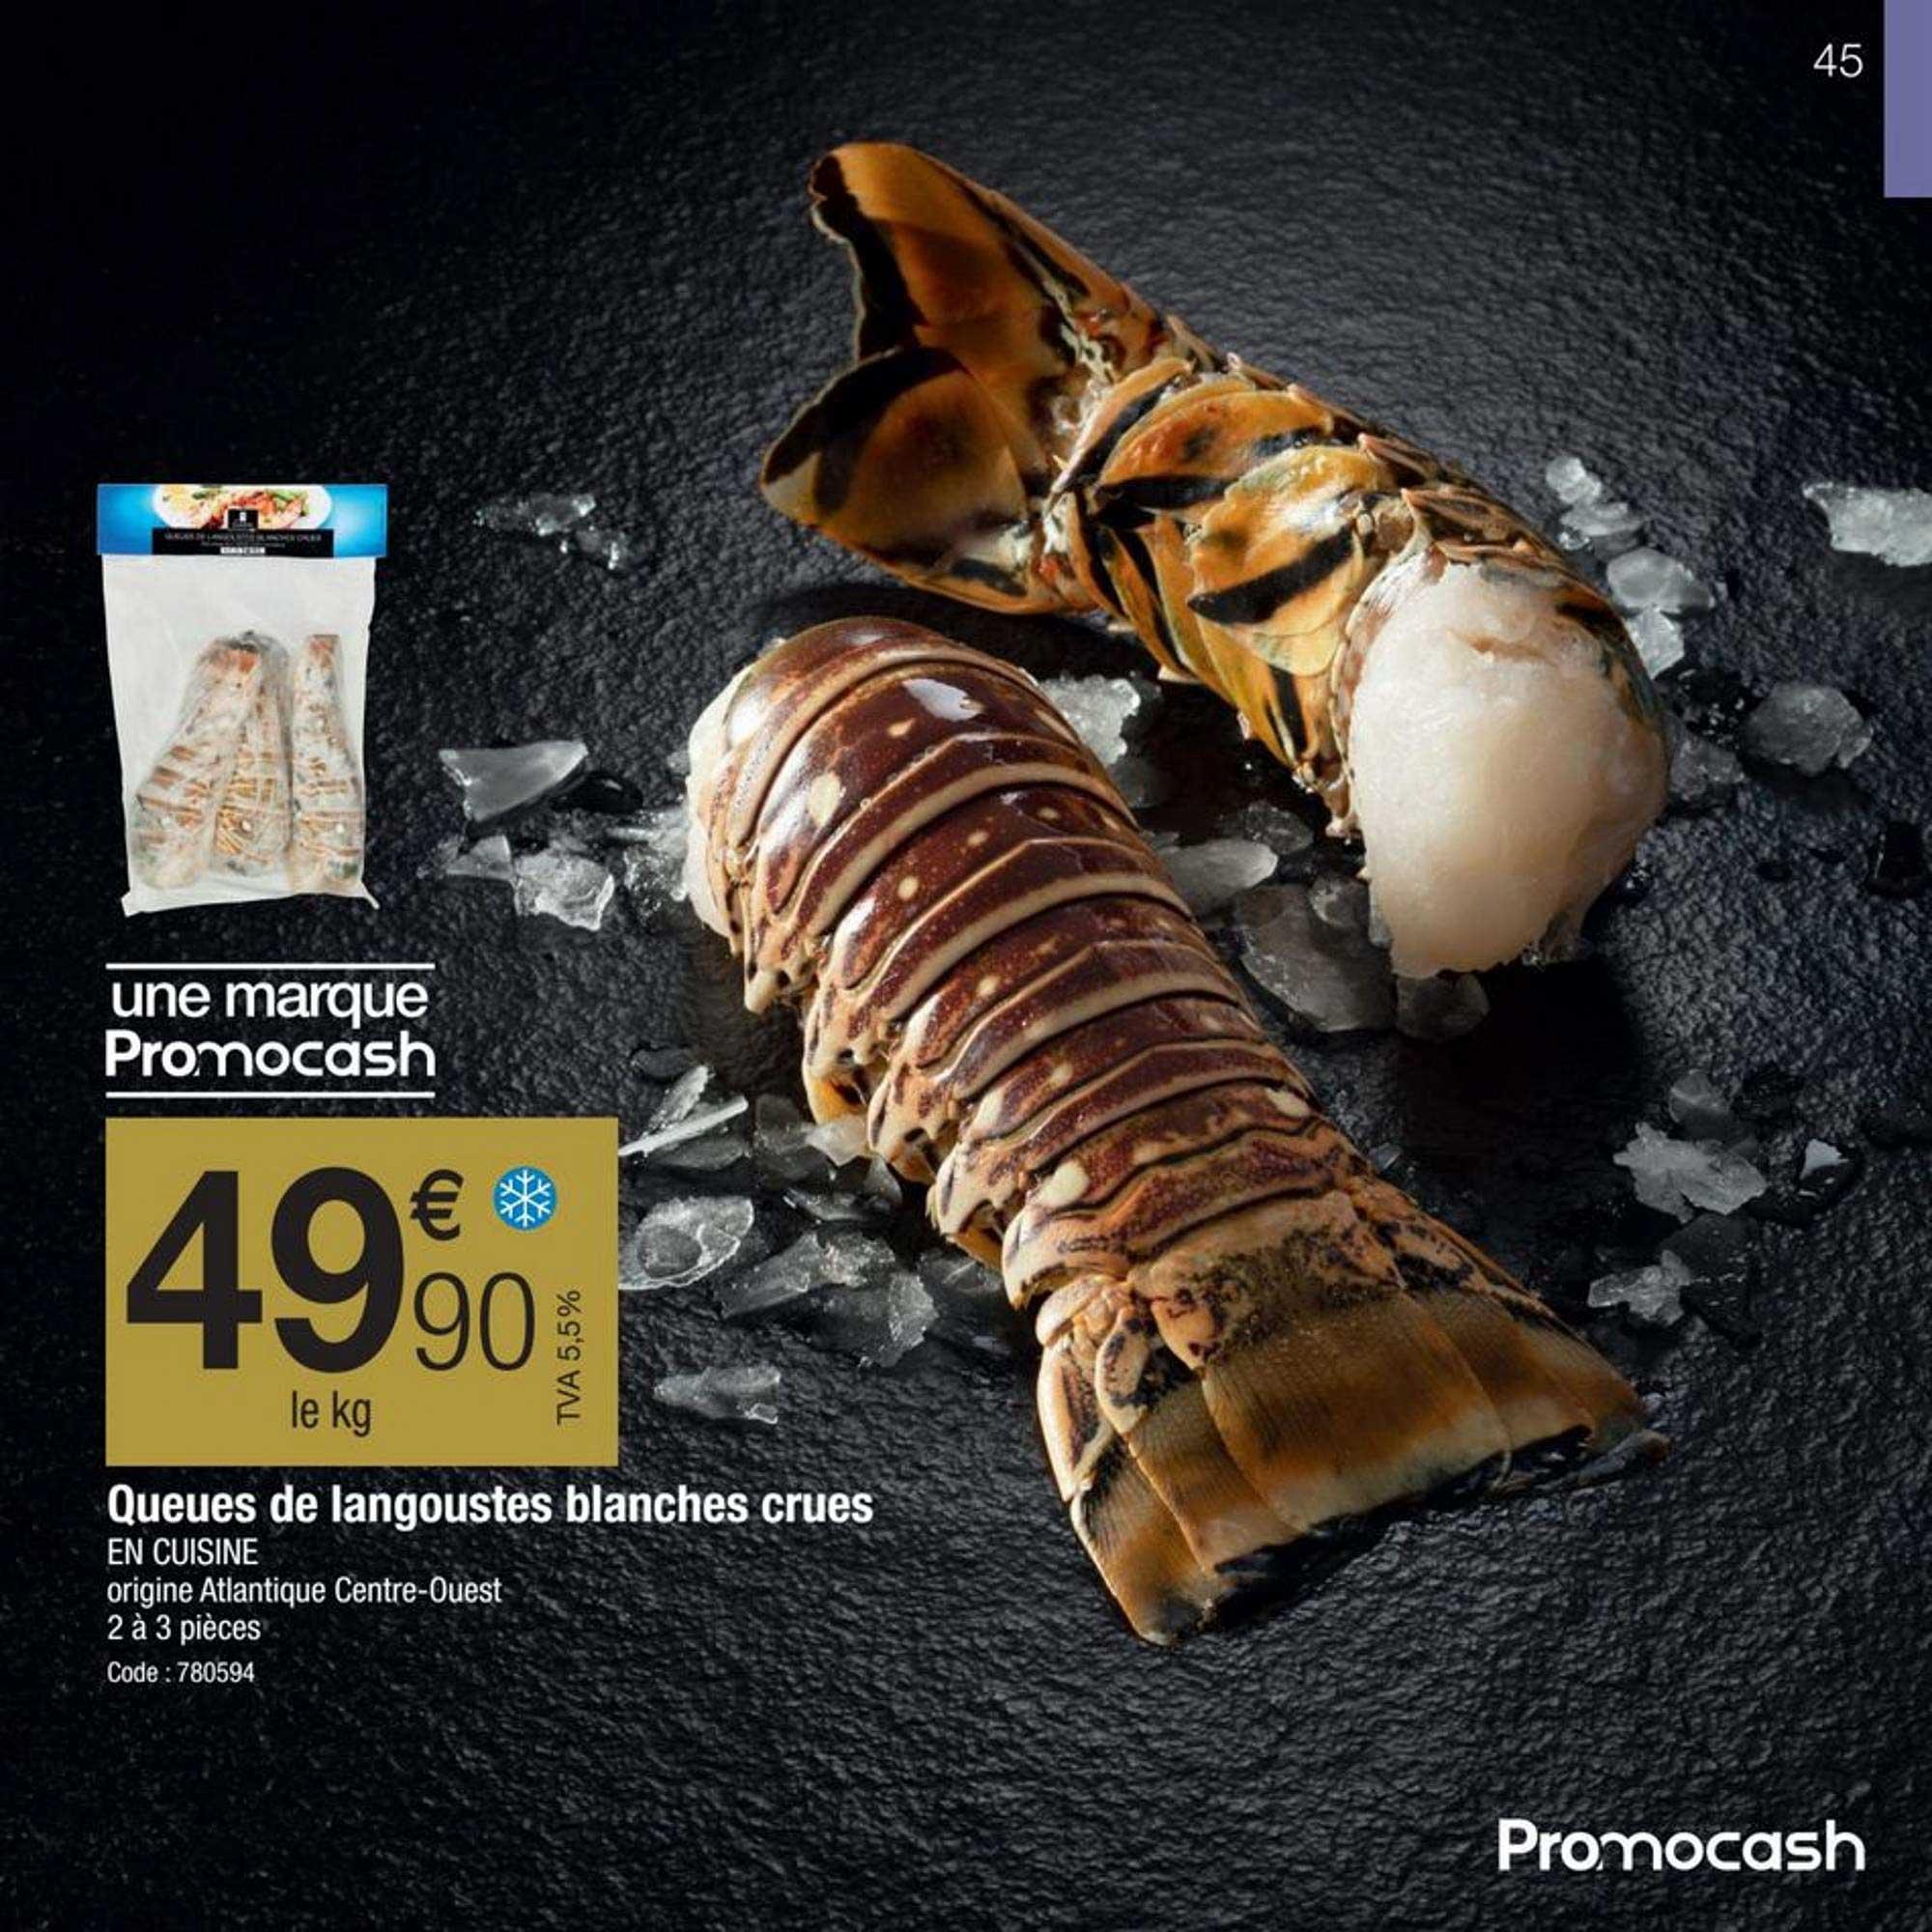 Promocash Queues De Langoustes Blanches Crues En Cuisine